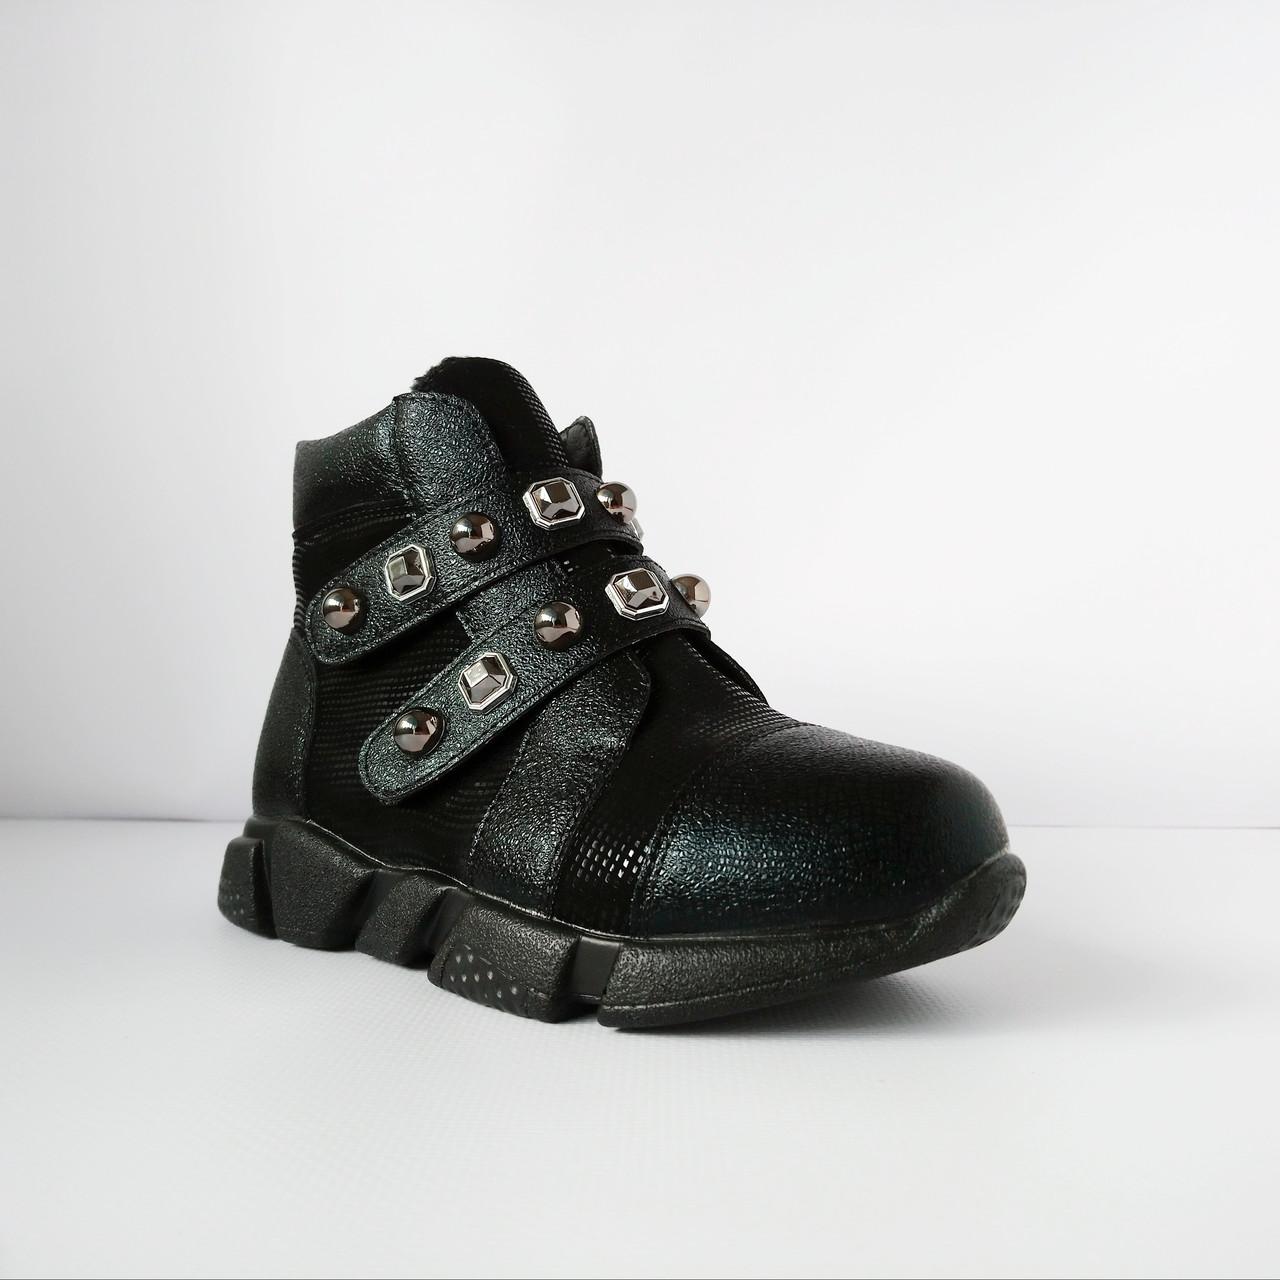 Сапоги - ботинки демисезонные девочкам, р. 31, 32, 33, 34, 35, 36